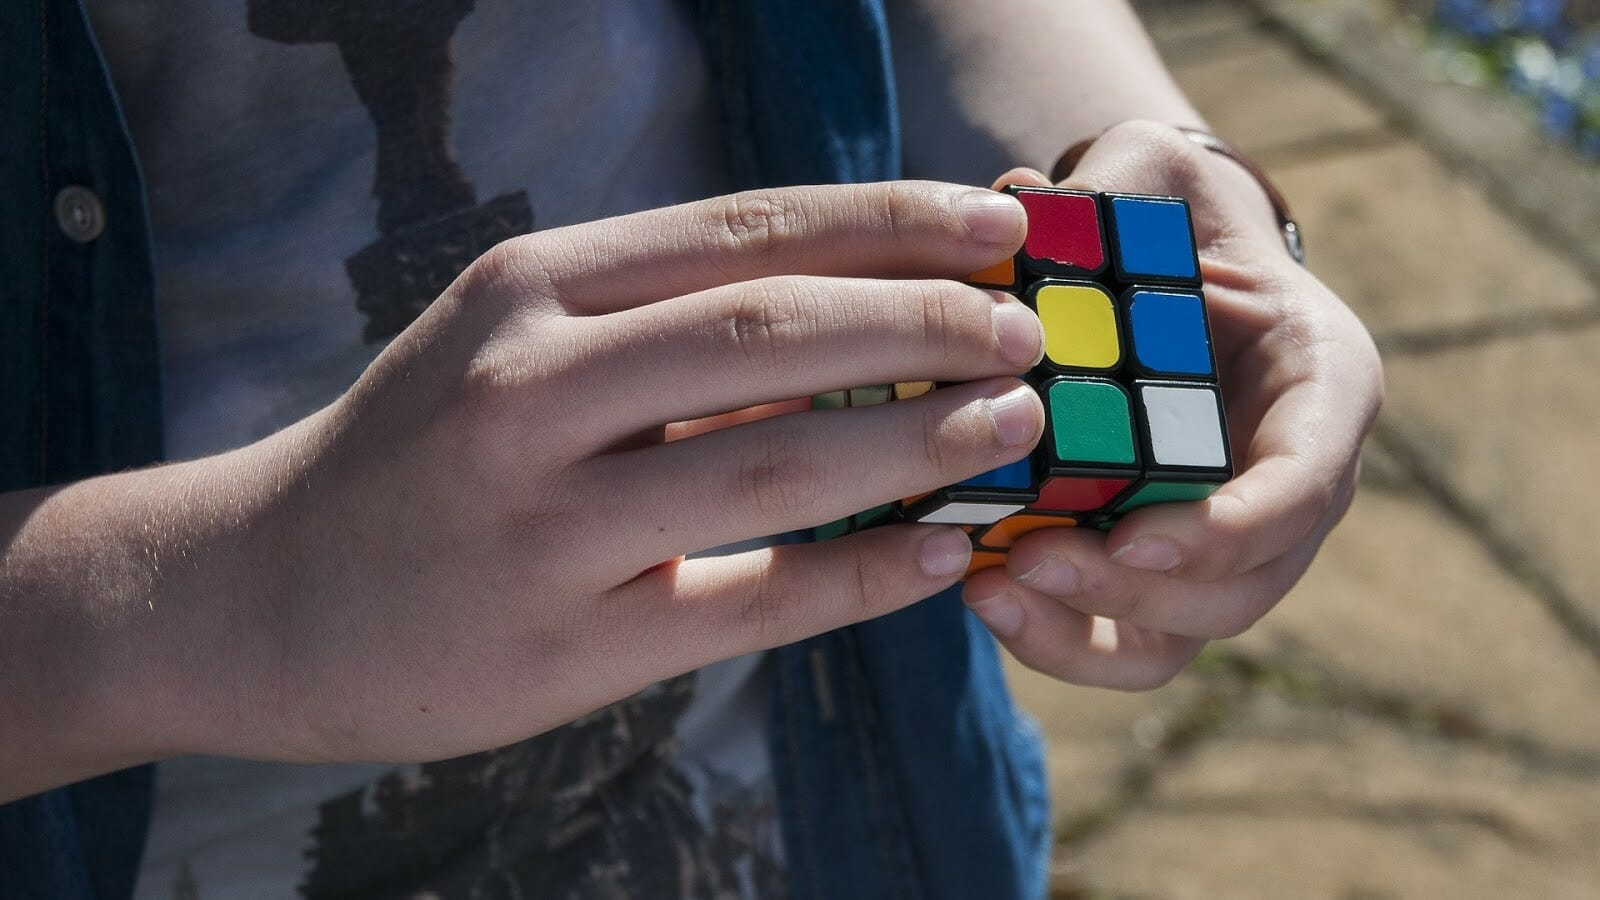 cube 2209365 1920